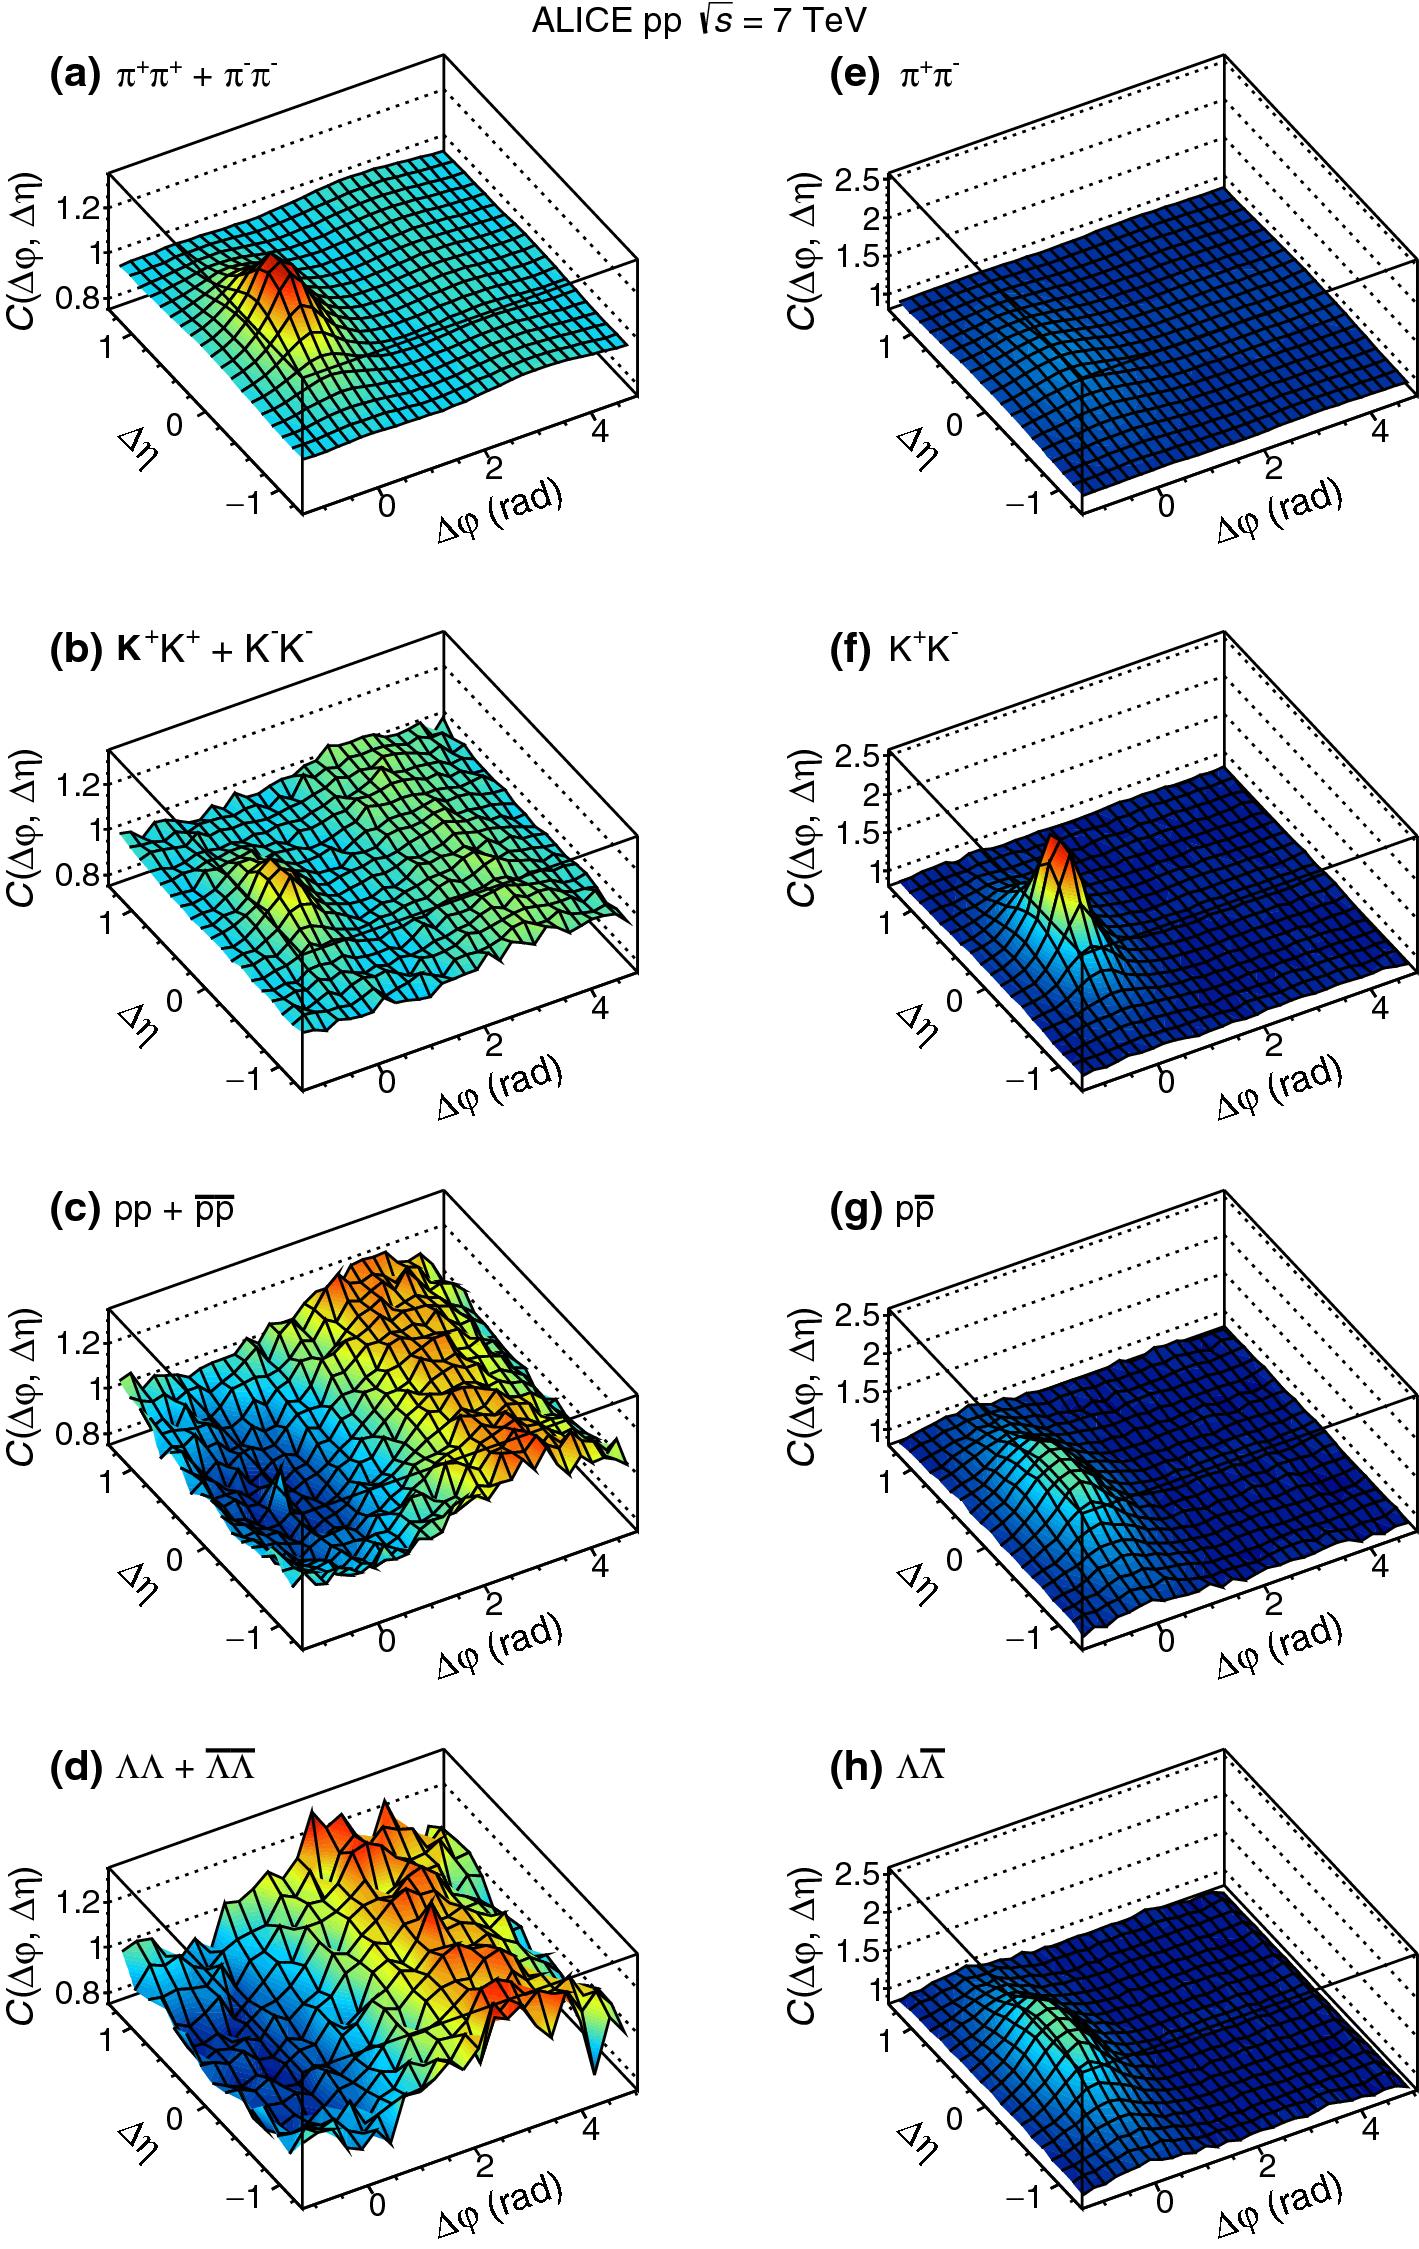 Erratum To Insight Into Particle Production Mechanisms Via